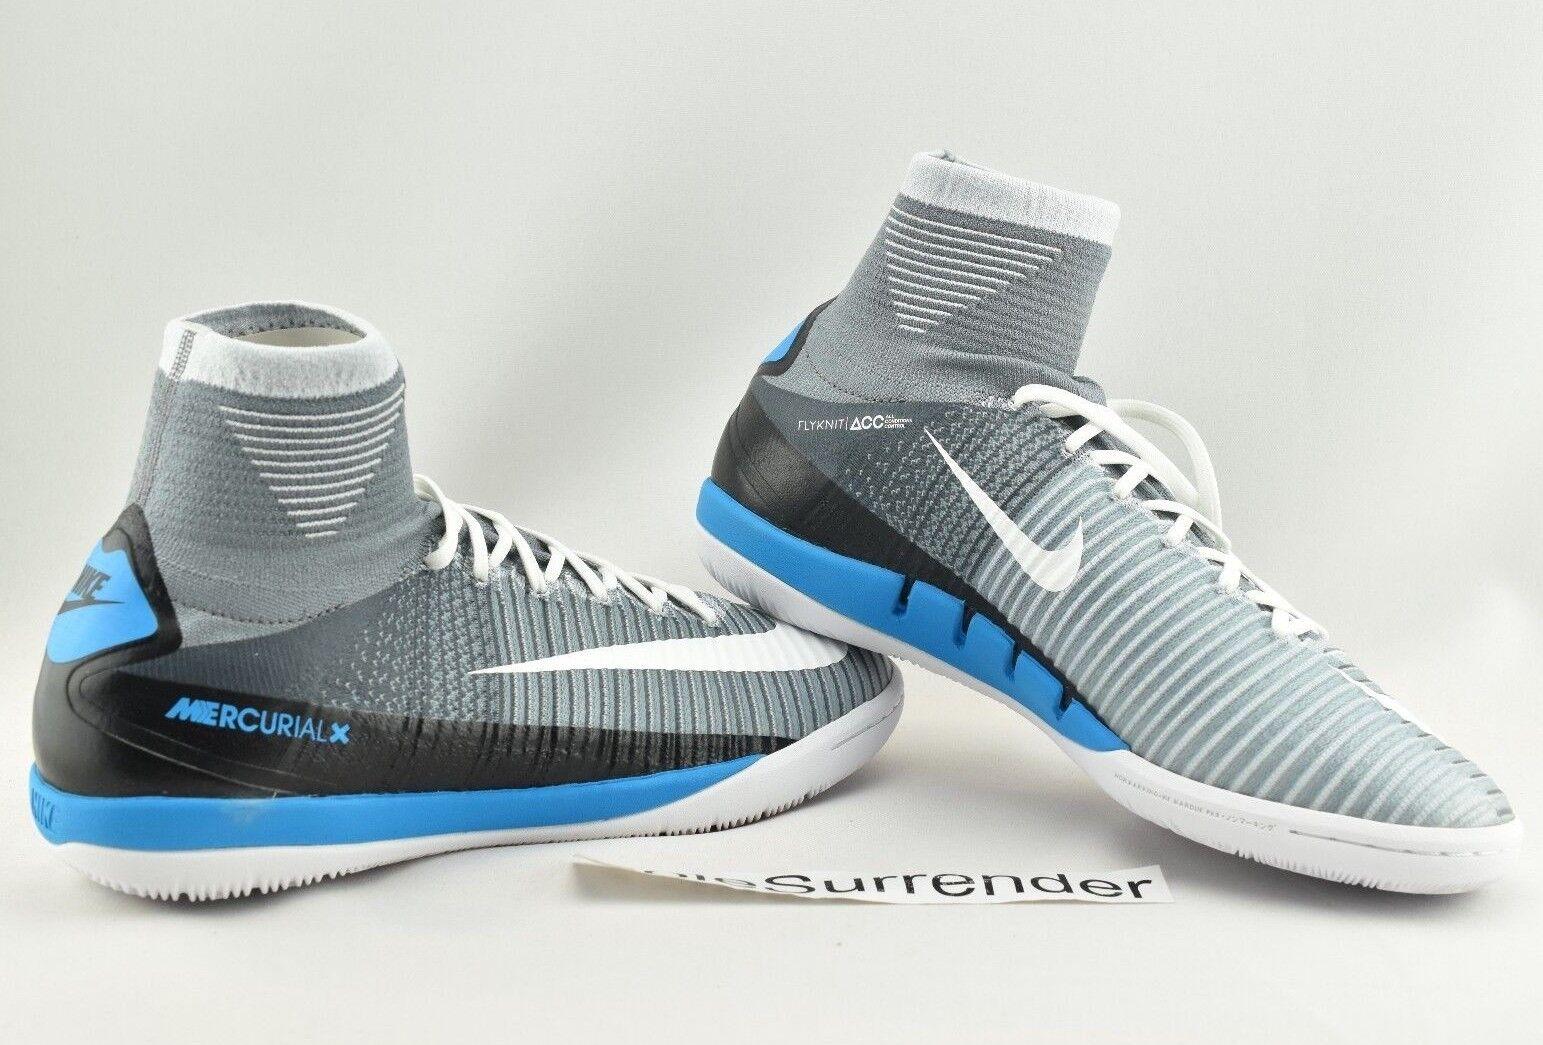 Nike MercurialX Proximo II DF IC - CHOOSE SIZE Blue  831976-010 Grey White Blue SIZE Black 6325ce